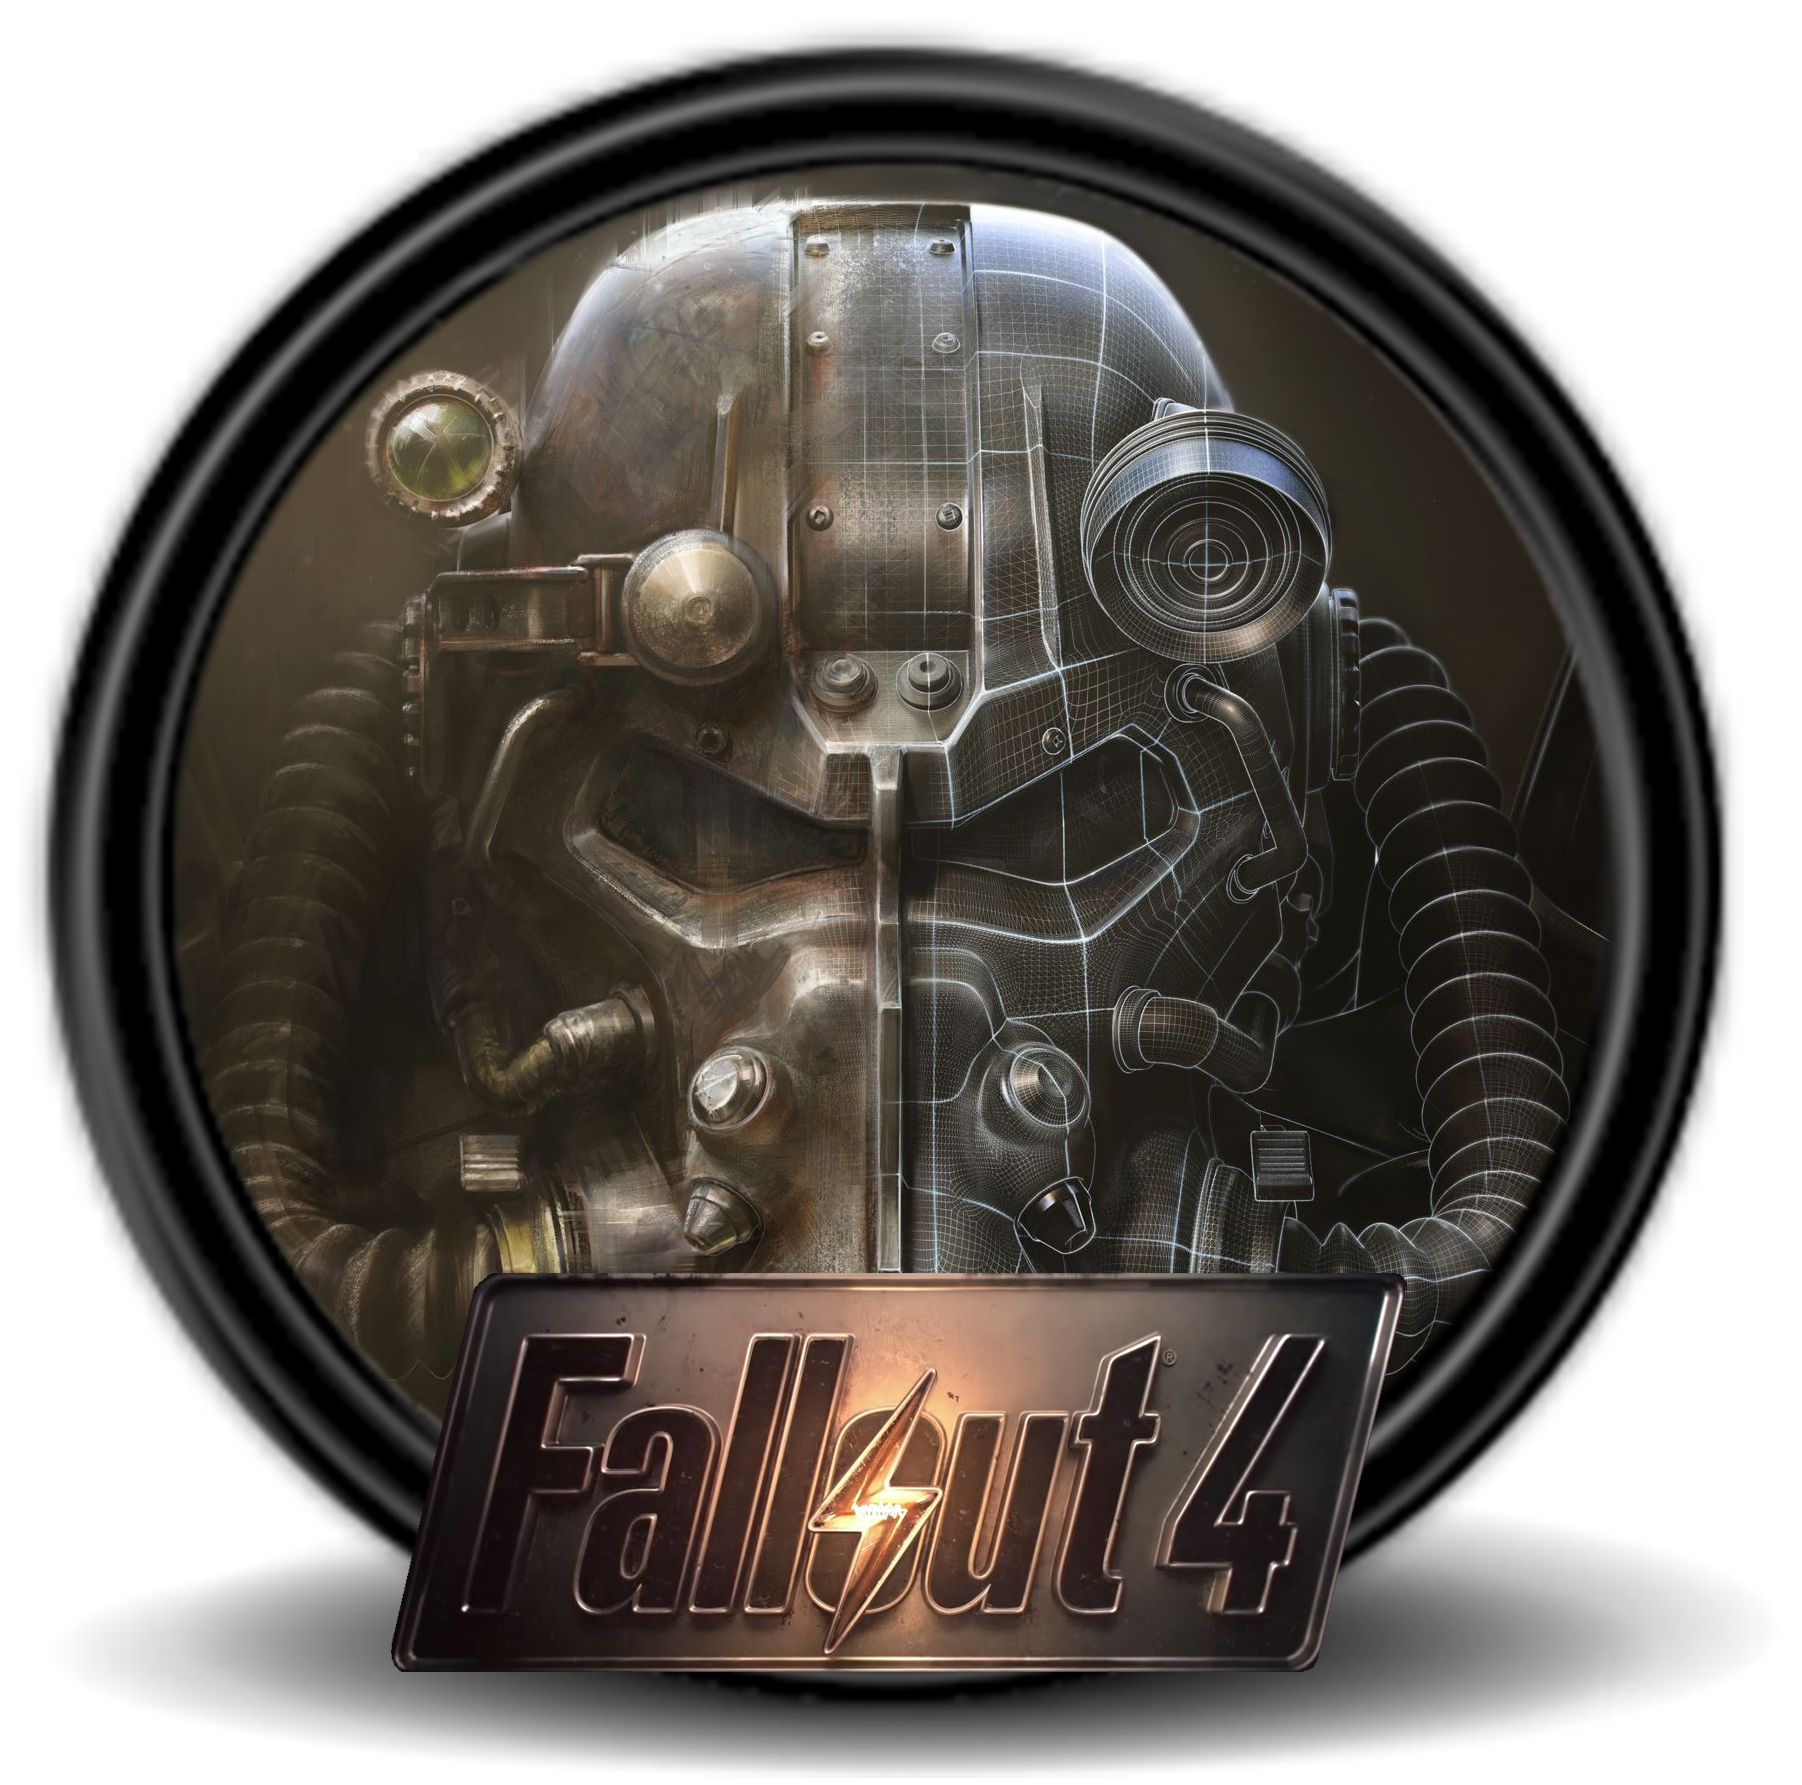 Fallout 4 Icon by EzeVig Fallout 4 Icon by EzeVig - Fallout 4 HD PNG